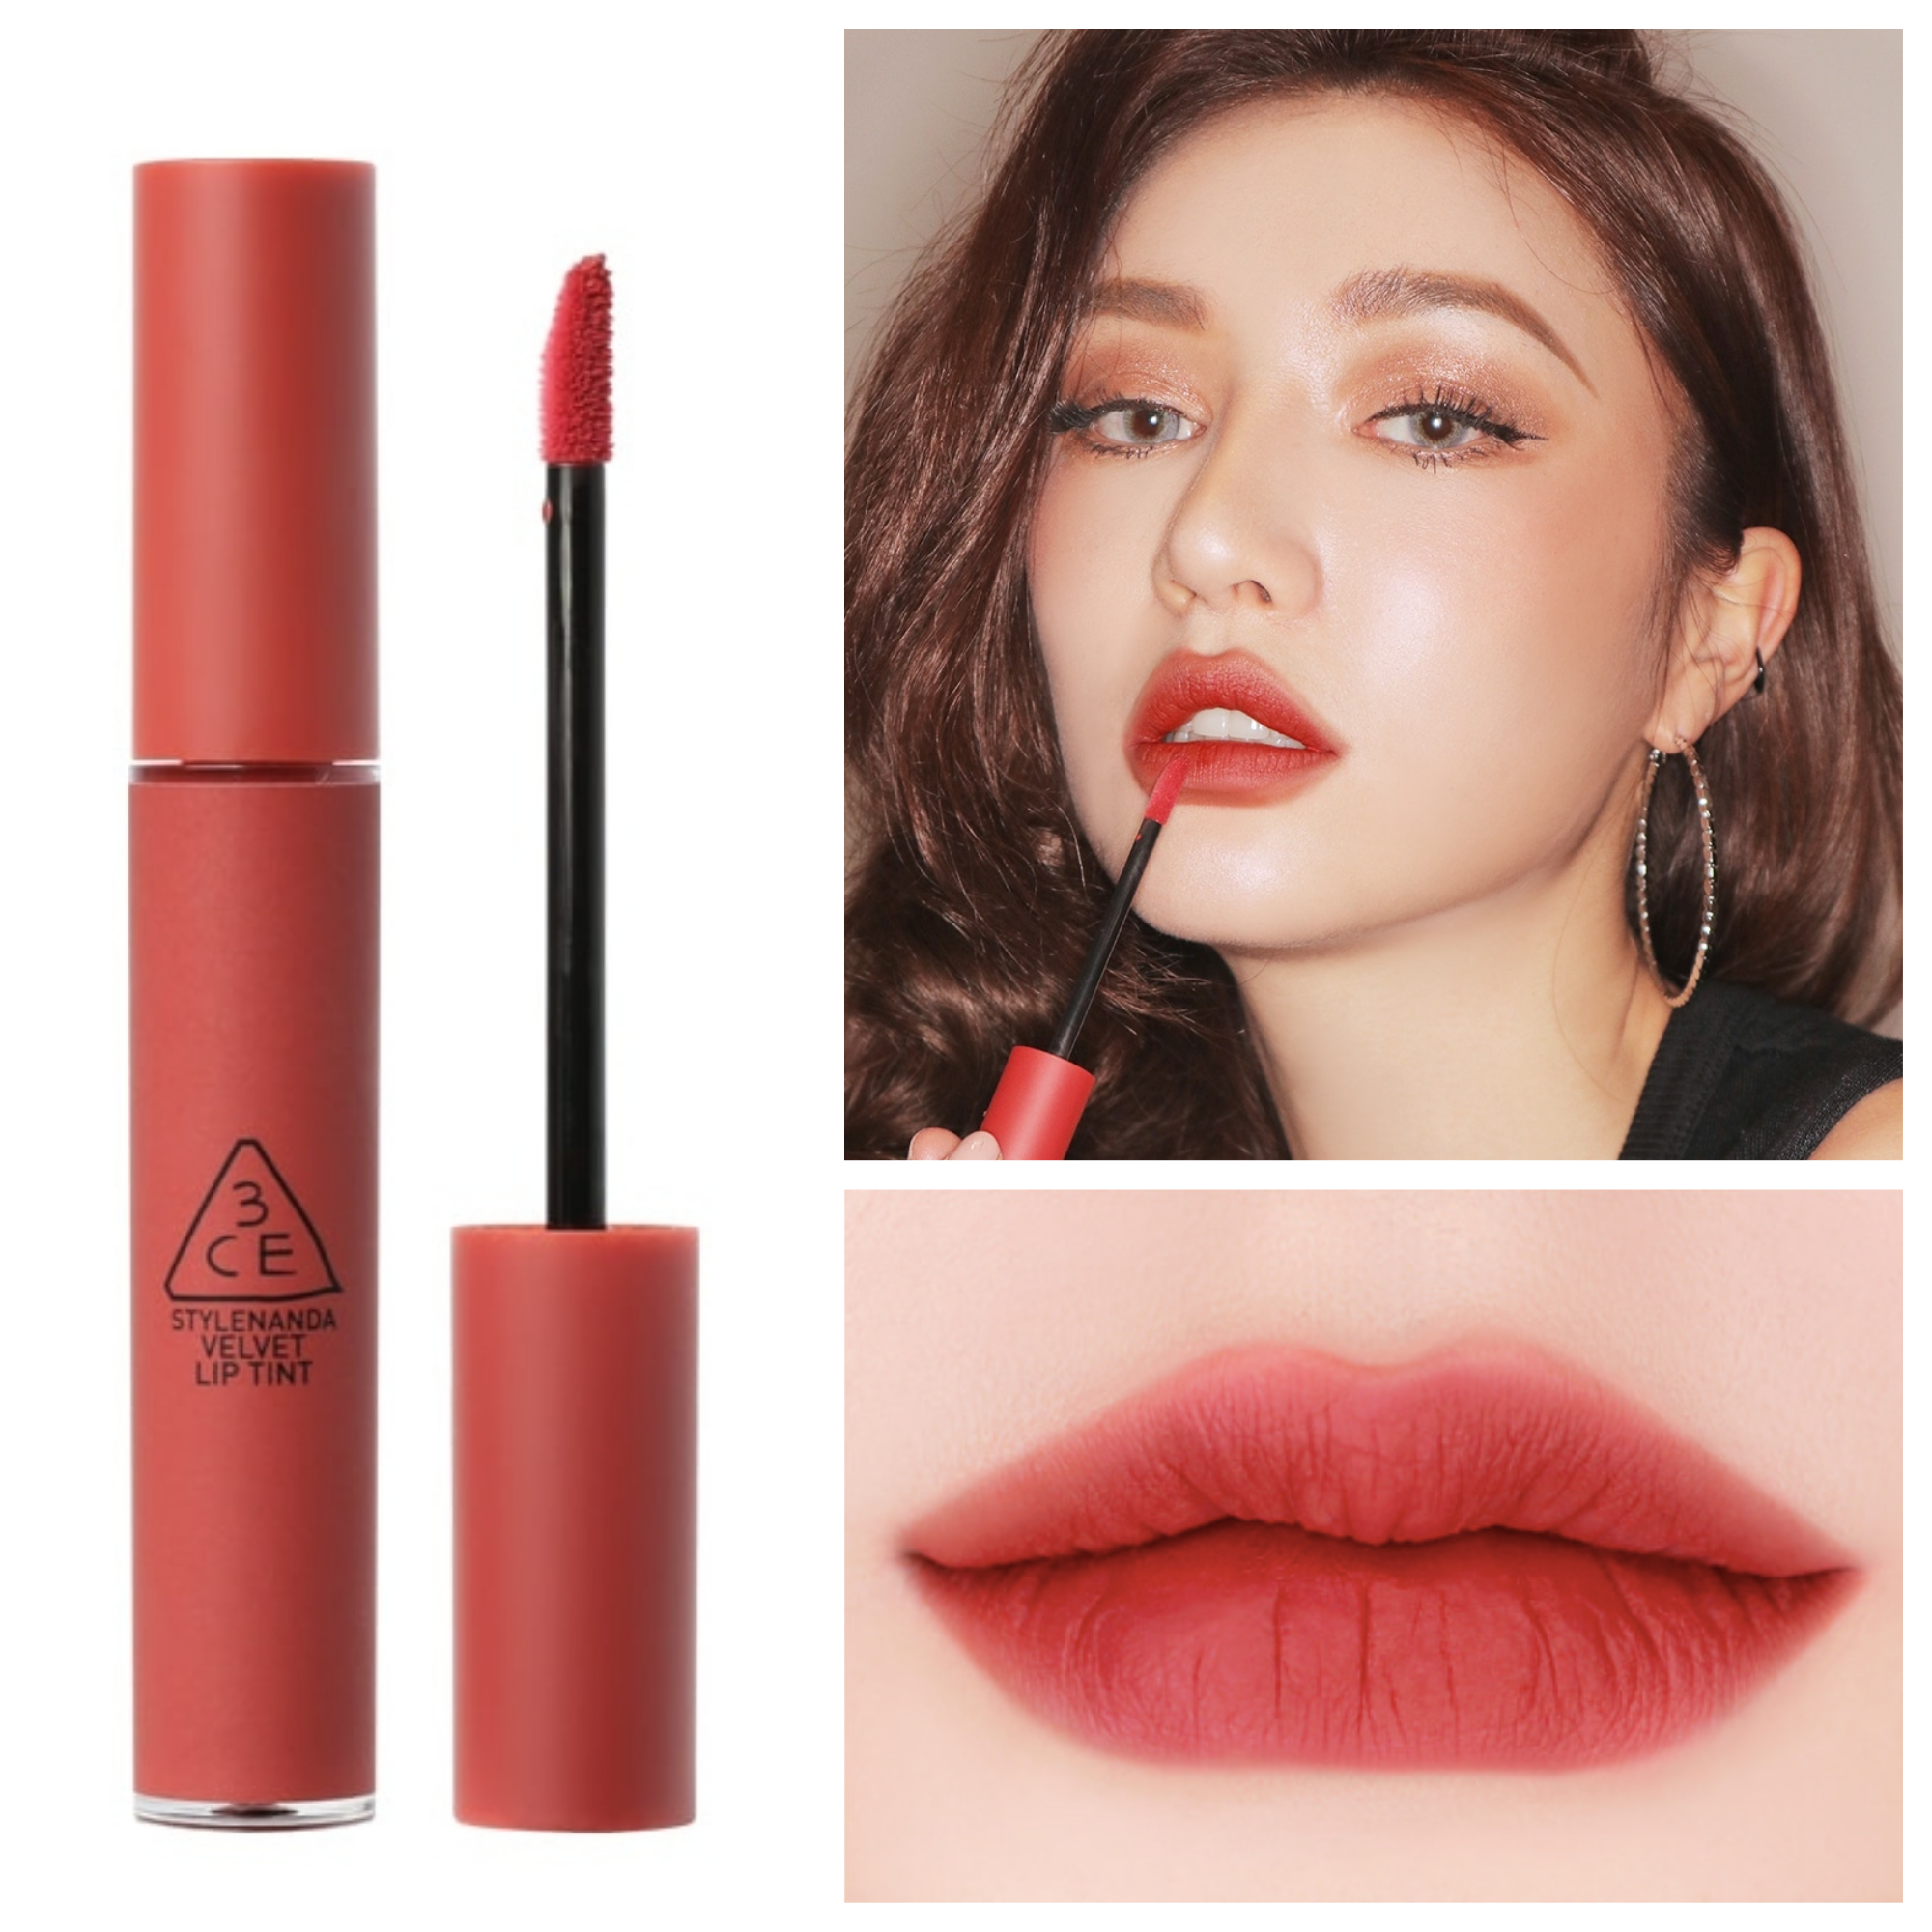 Bảng màu son 3CE Velvet Lip Tint Daffodil